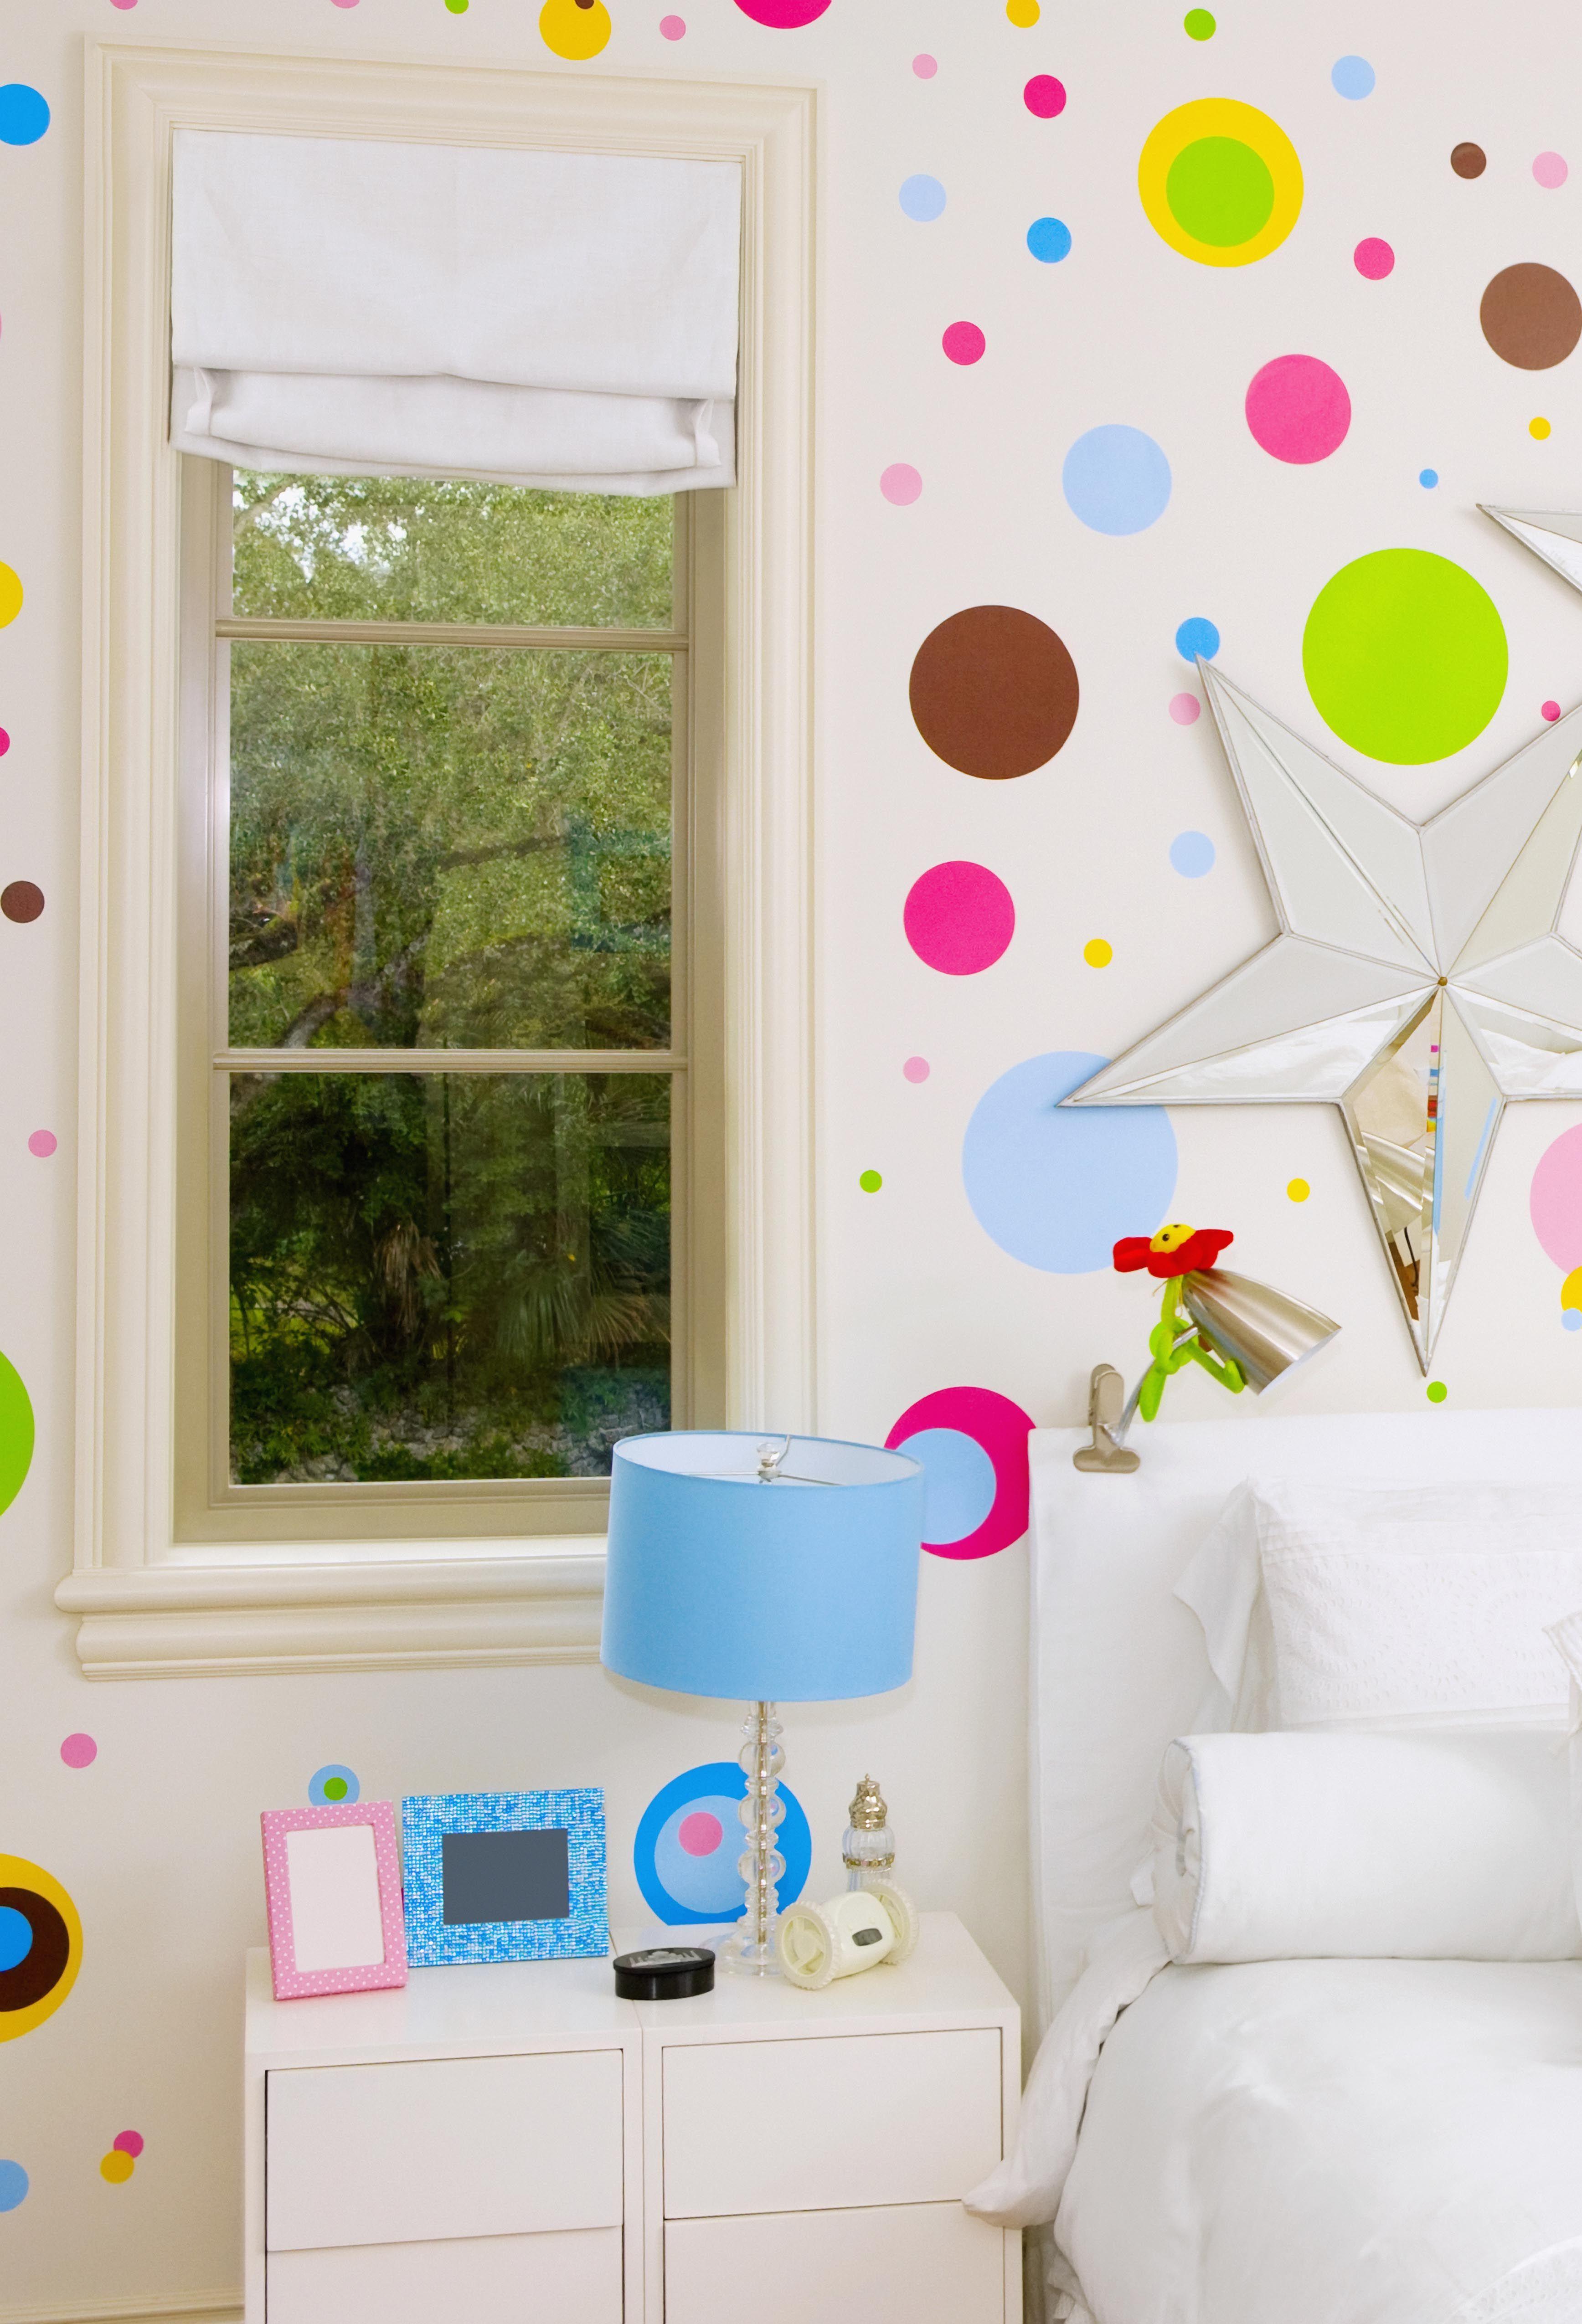 & Interior Designer Window Tricks - How to Make Windows Look Bigger